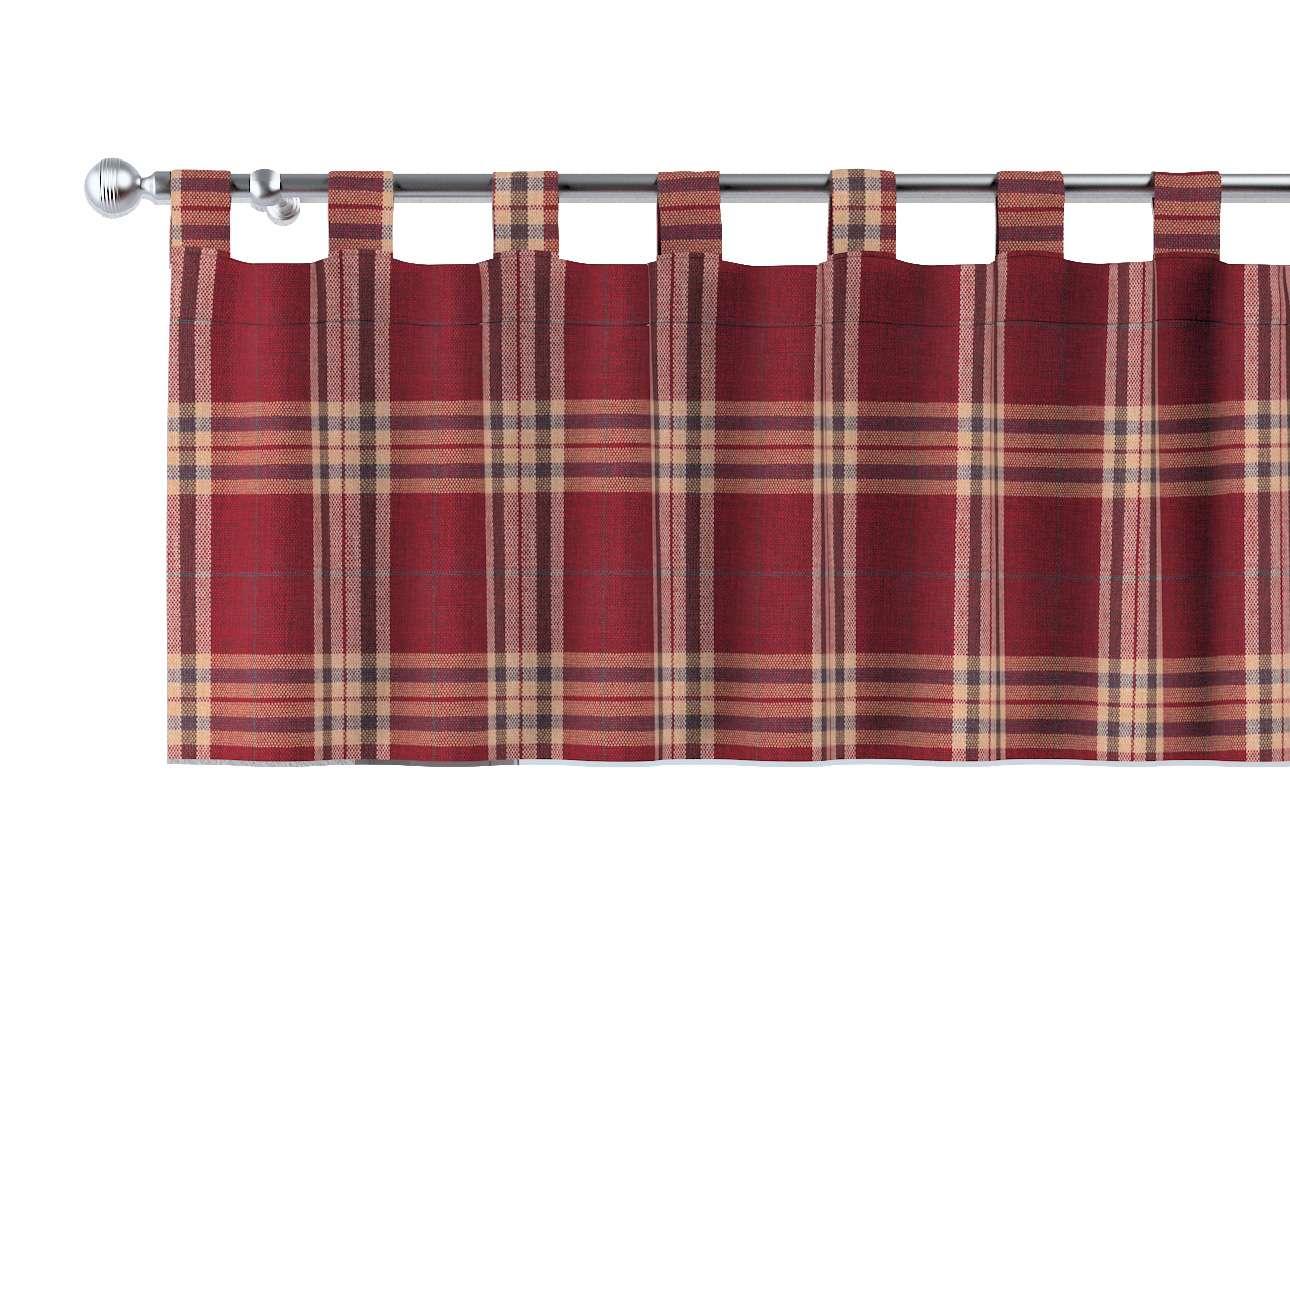 Lambrekin na szelkach 130x40cm w kolekcji Mirella, tkanina: 141-06